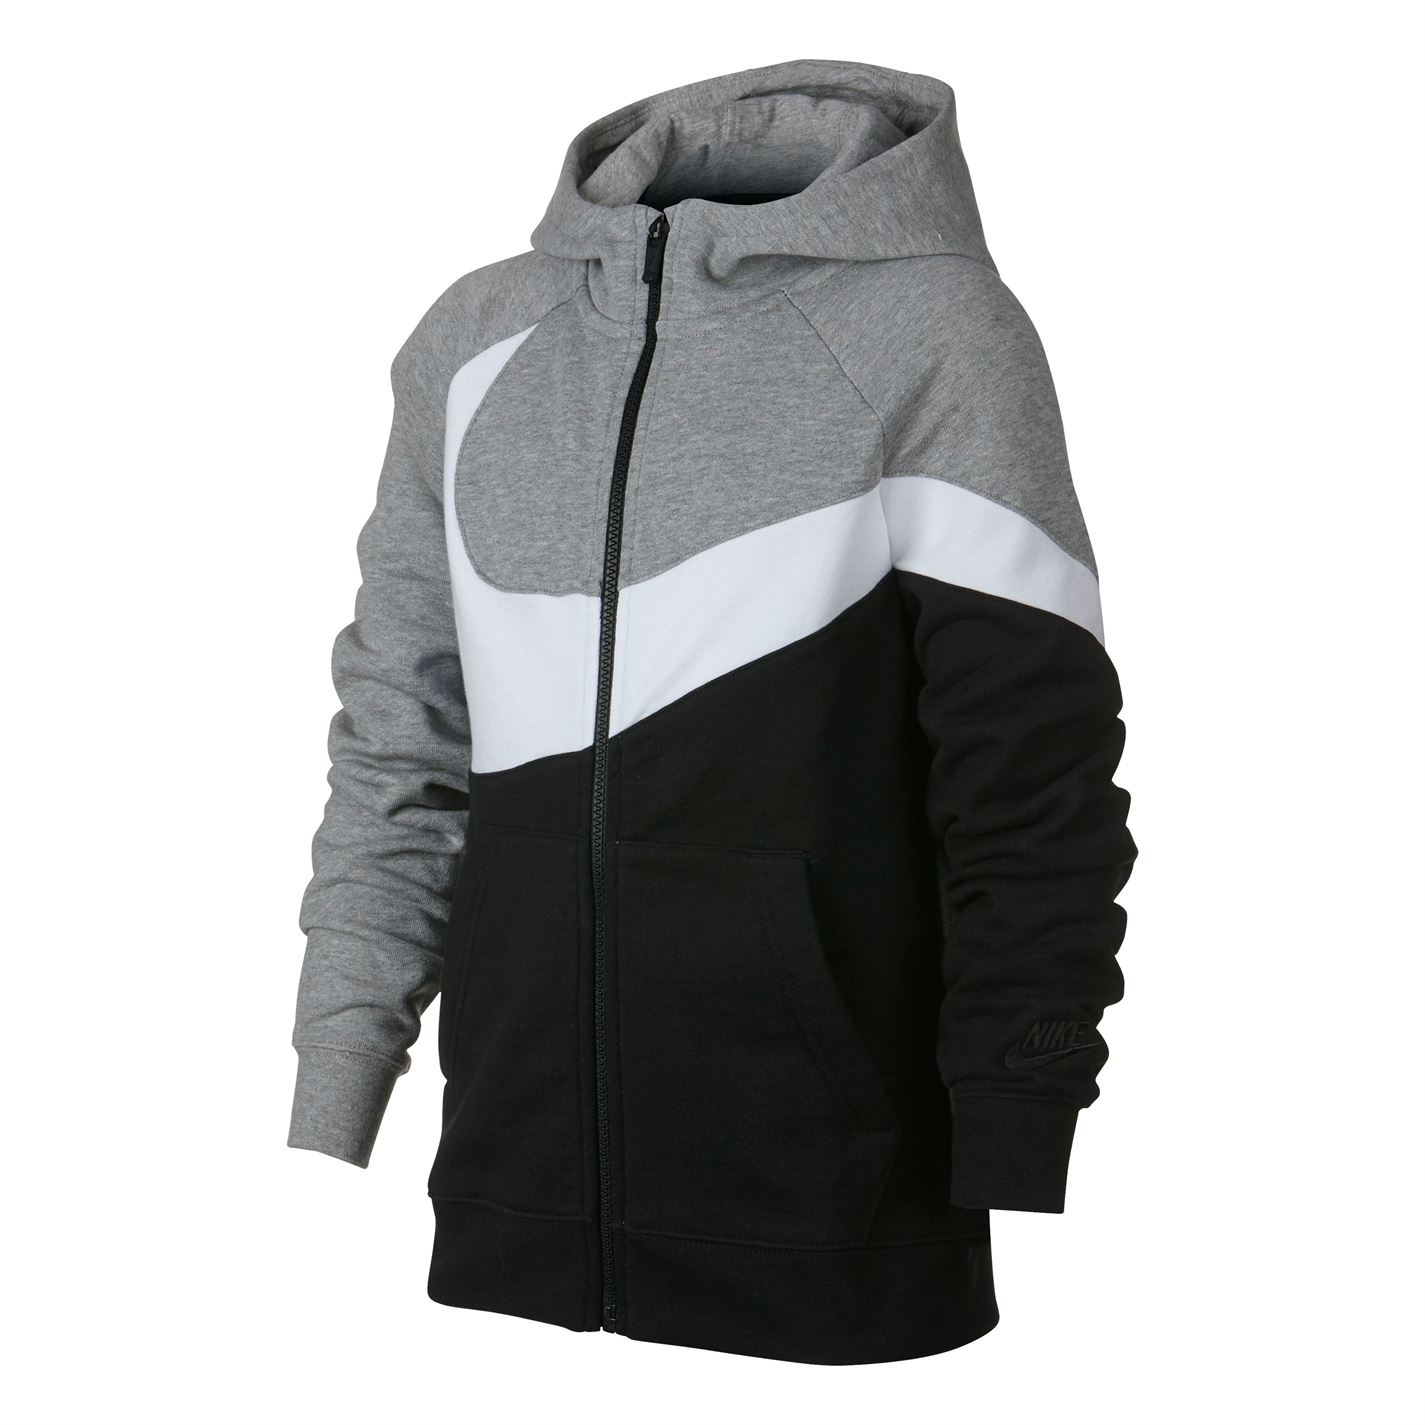 Mikina s kapucí Nike HBR Swoosh Hoody Junior Boys - Glami.cz bb12e1b687f